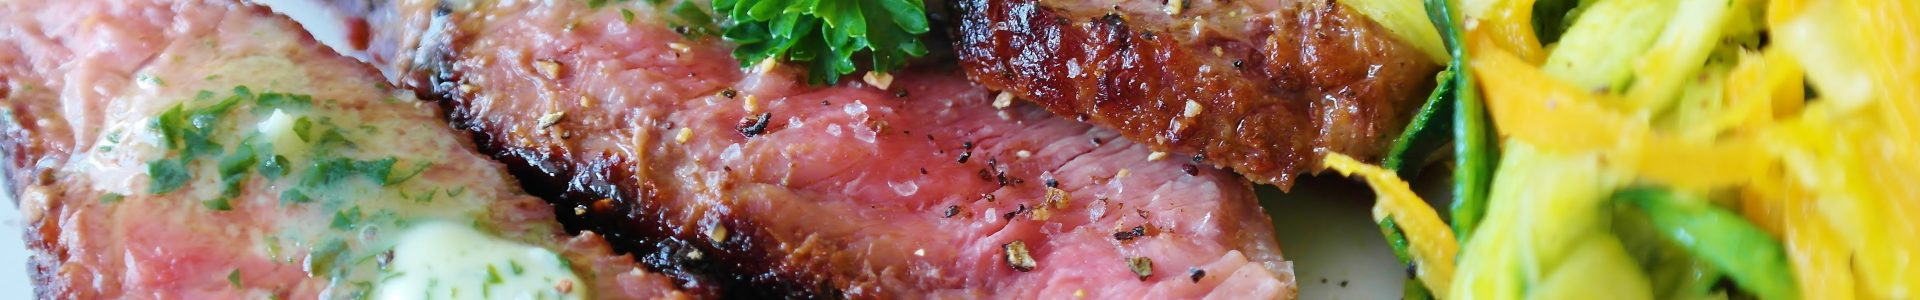 steak-3640560